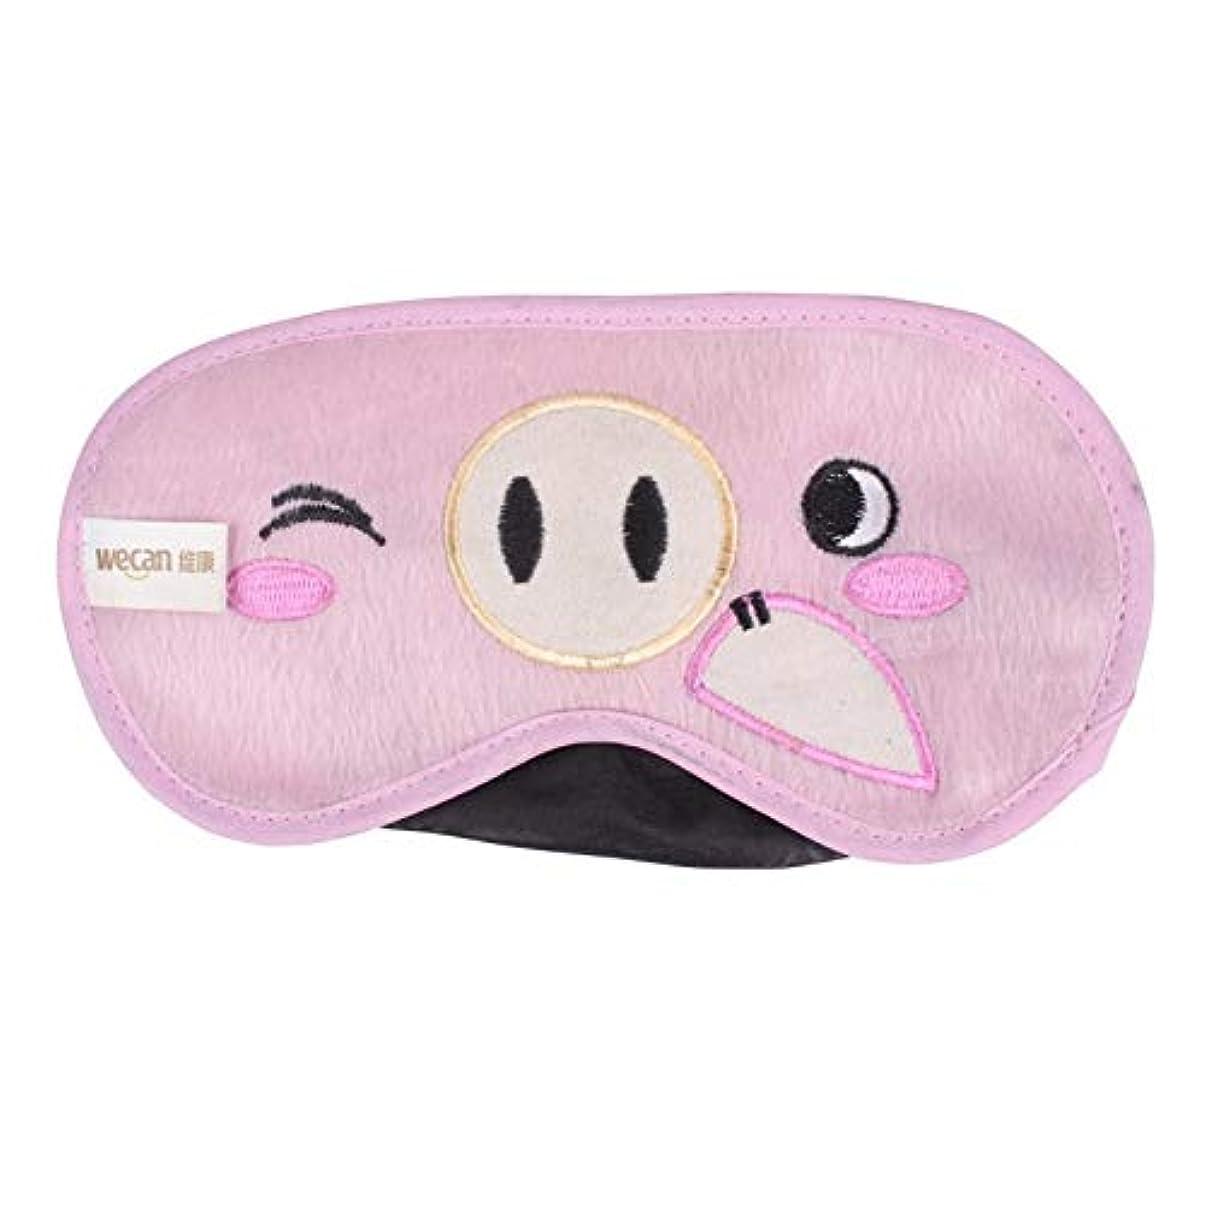 NOTE ポータブル竹カーボン布アイマスクアイシェードカバー旅行残り睡眠目隠しアイパッチゴーグルピンク豚スタイル